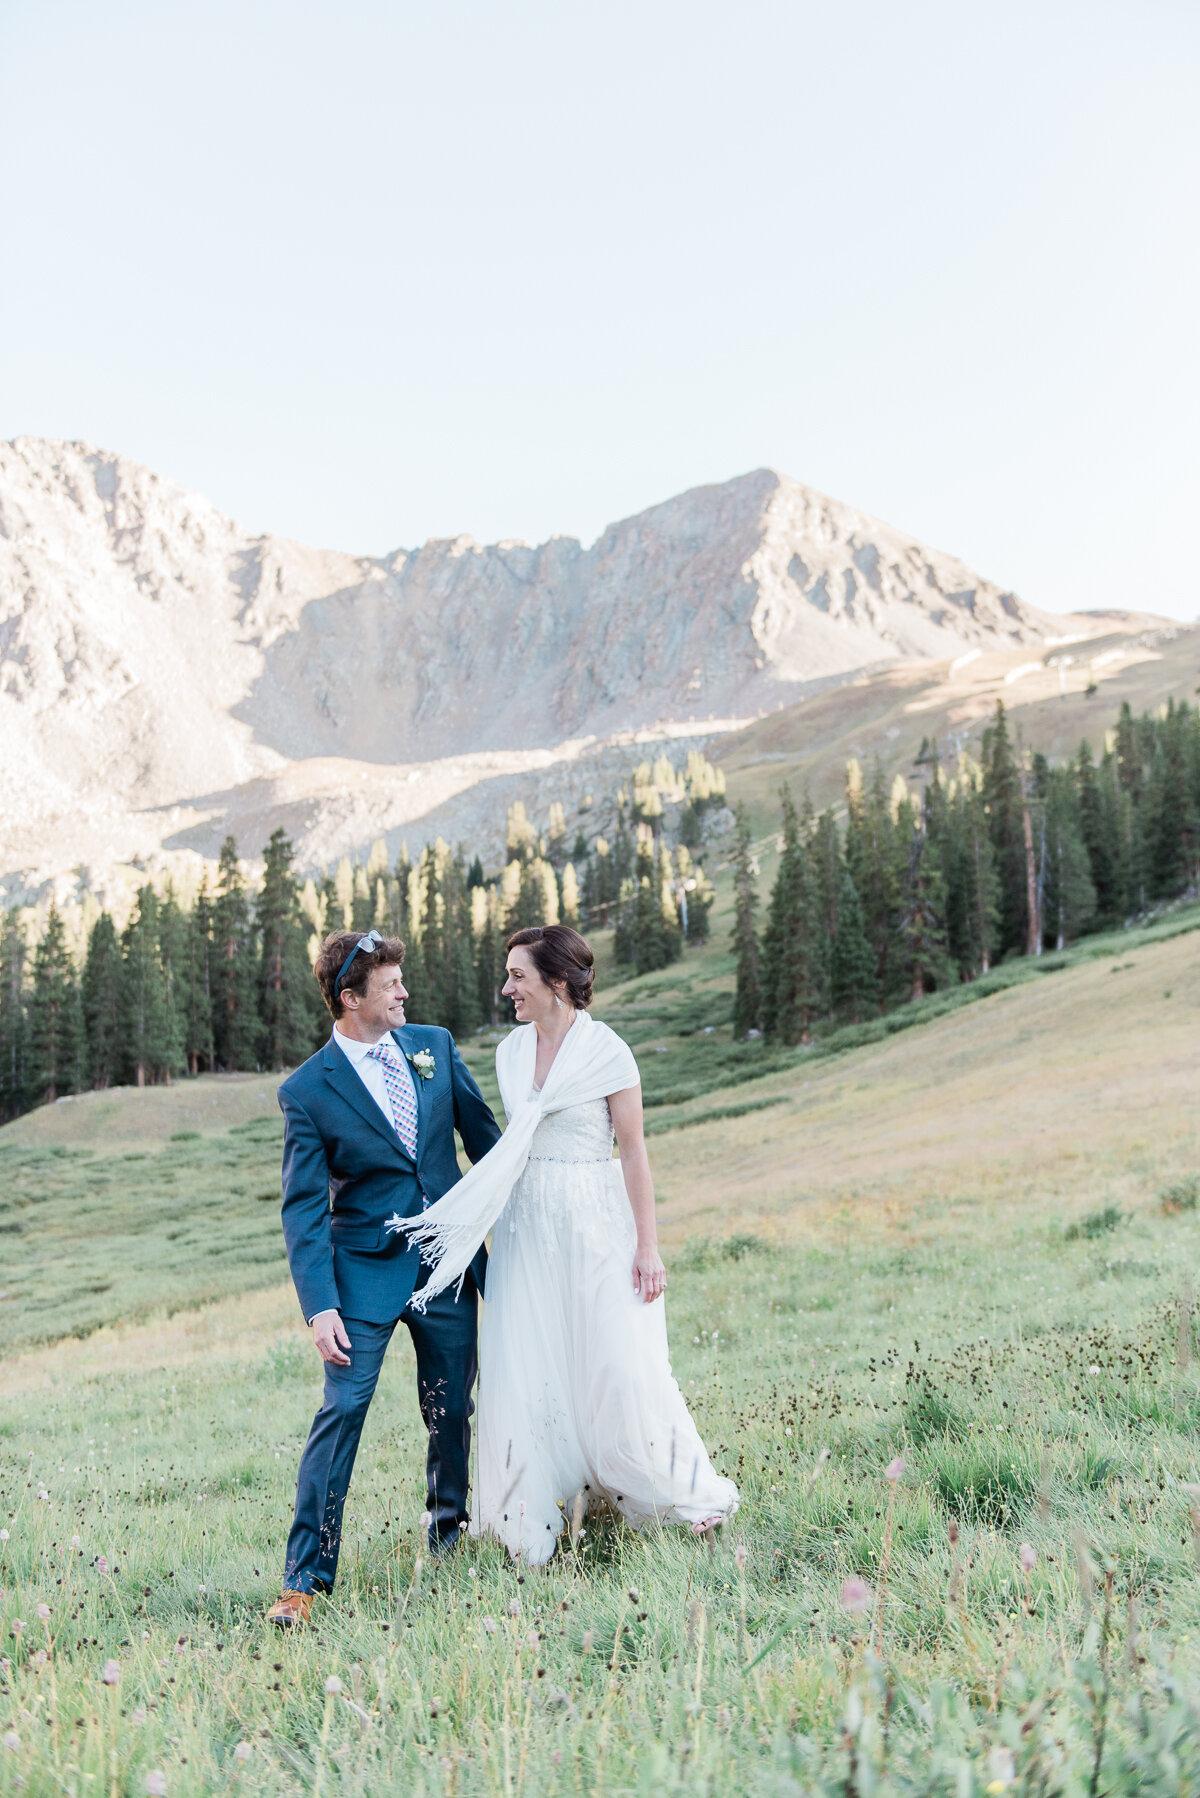 AshleighMillerPhotography-Wedding-Natalia-Matt-ArapahoeBasin-Colorado-34.jpg